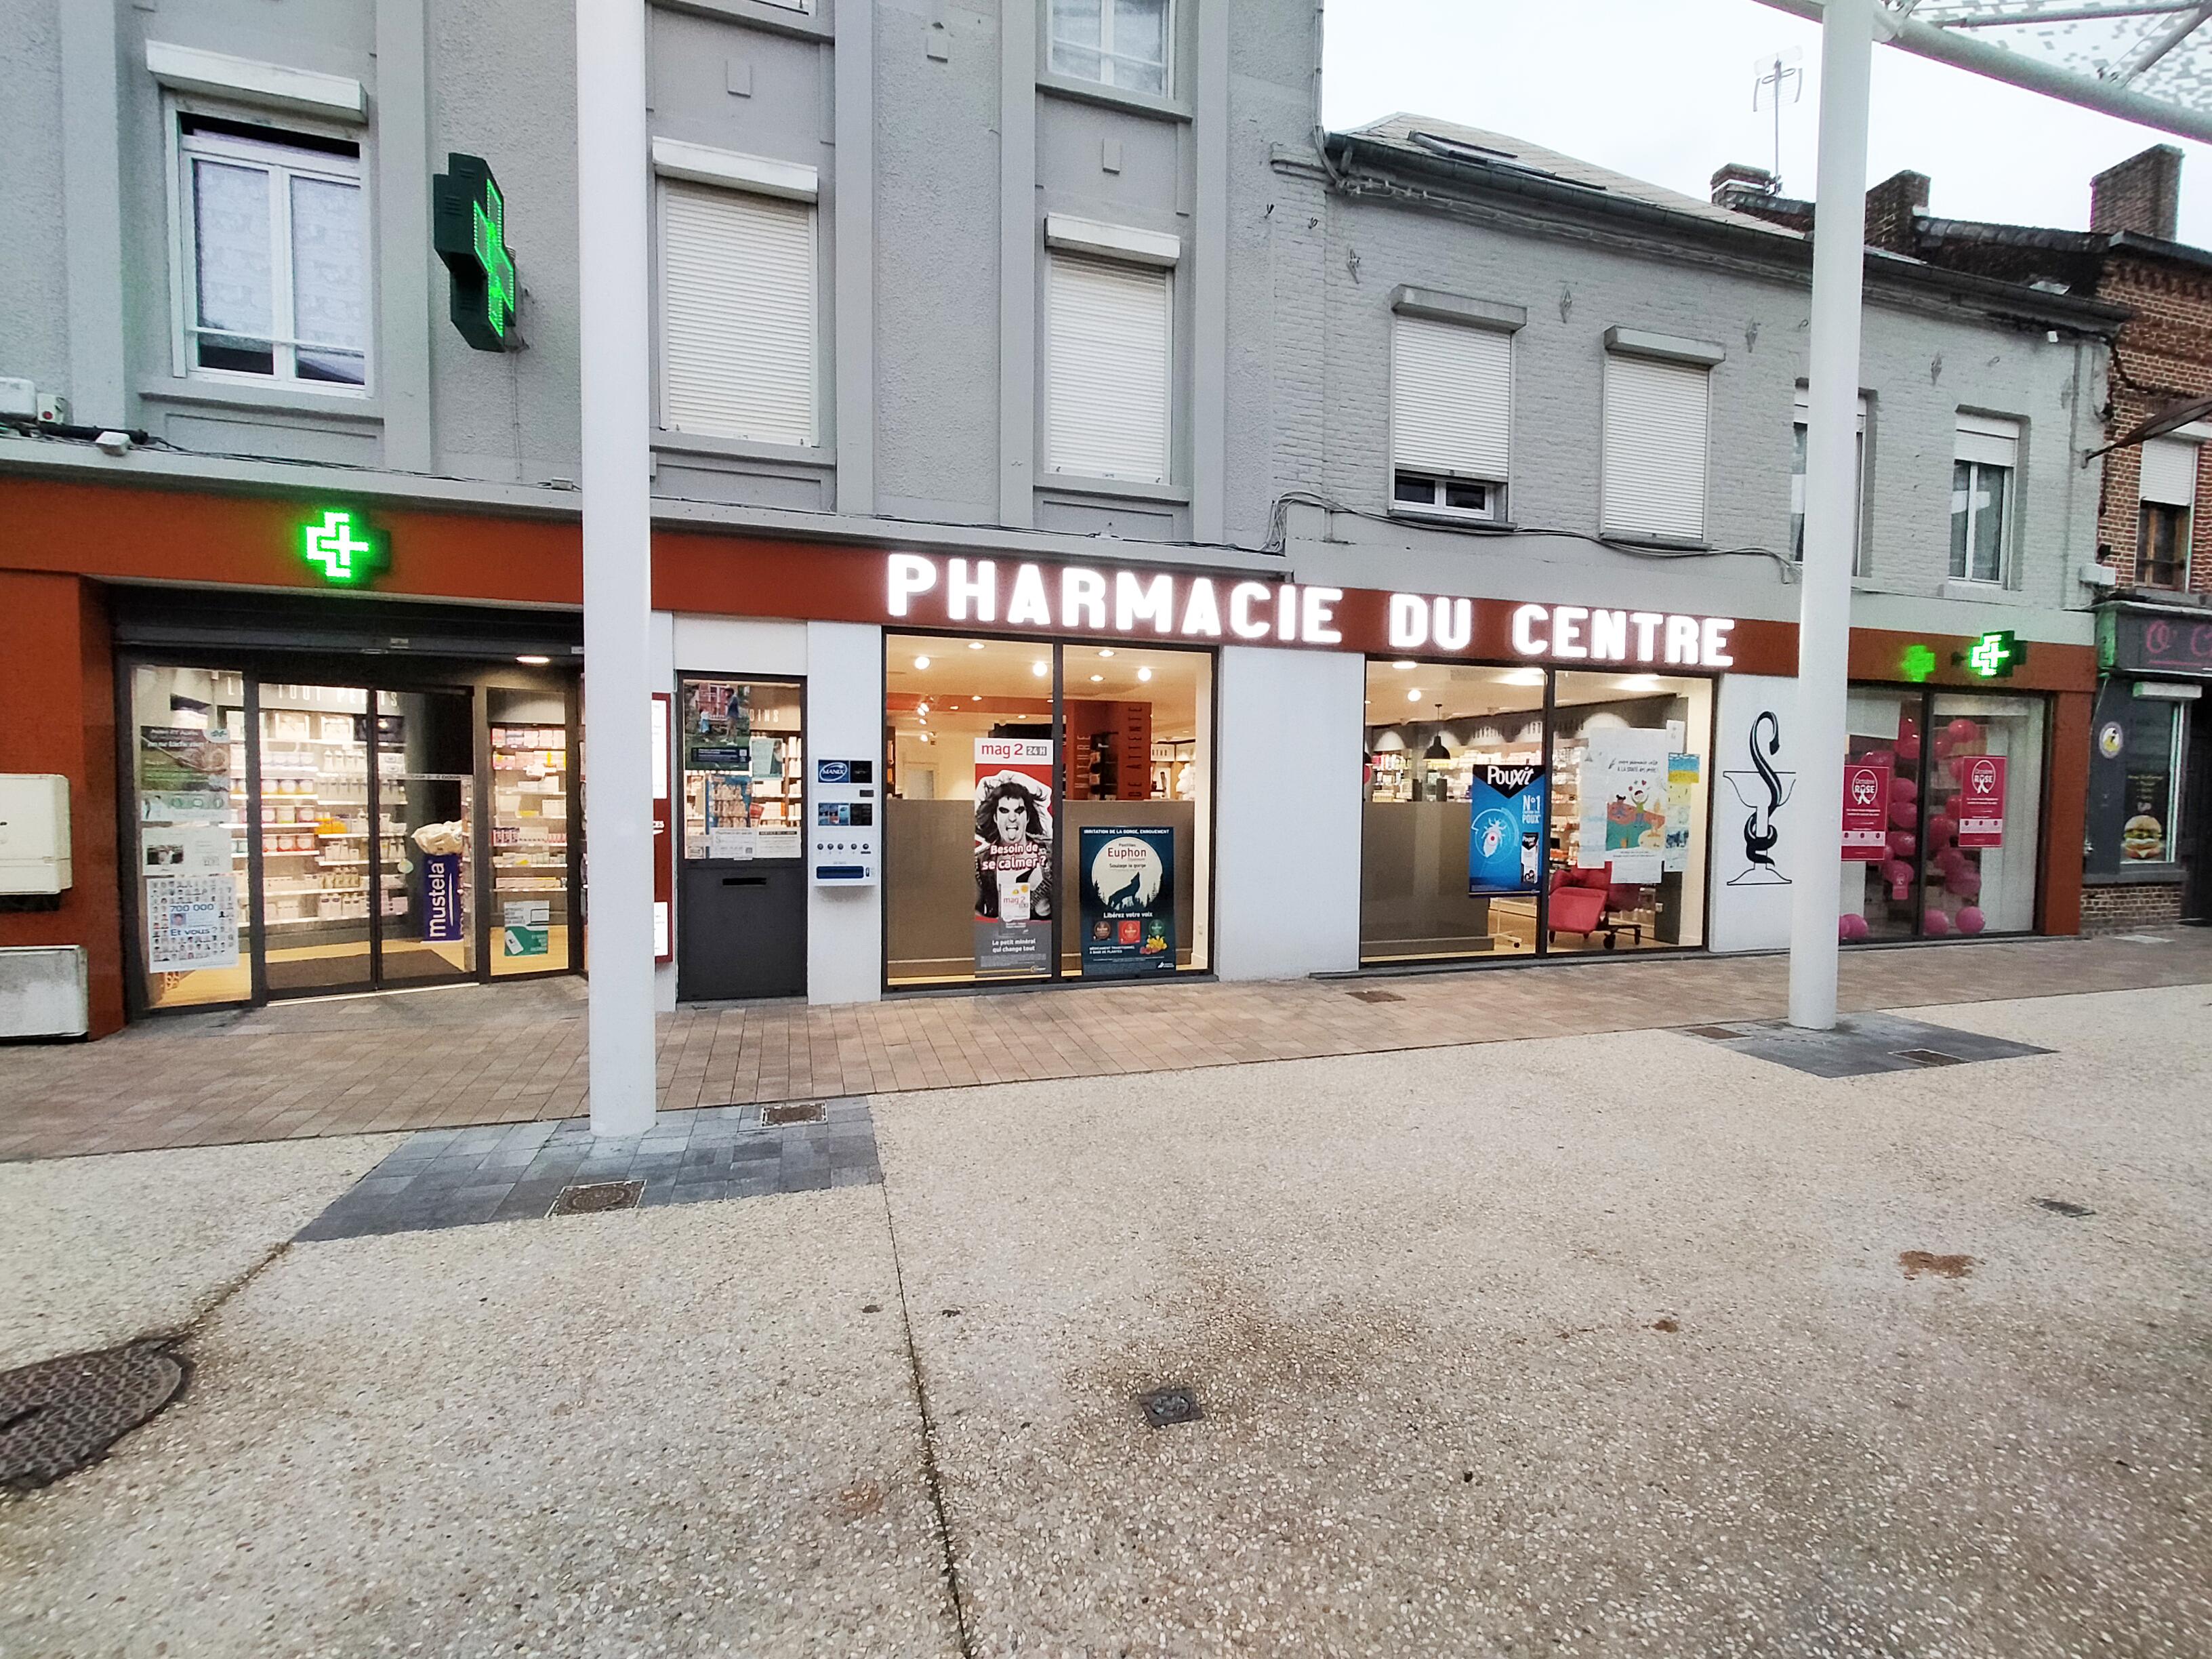 Pharmacie Du Centre - Aulnoye-Aymeries